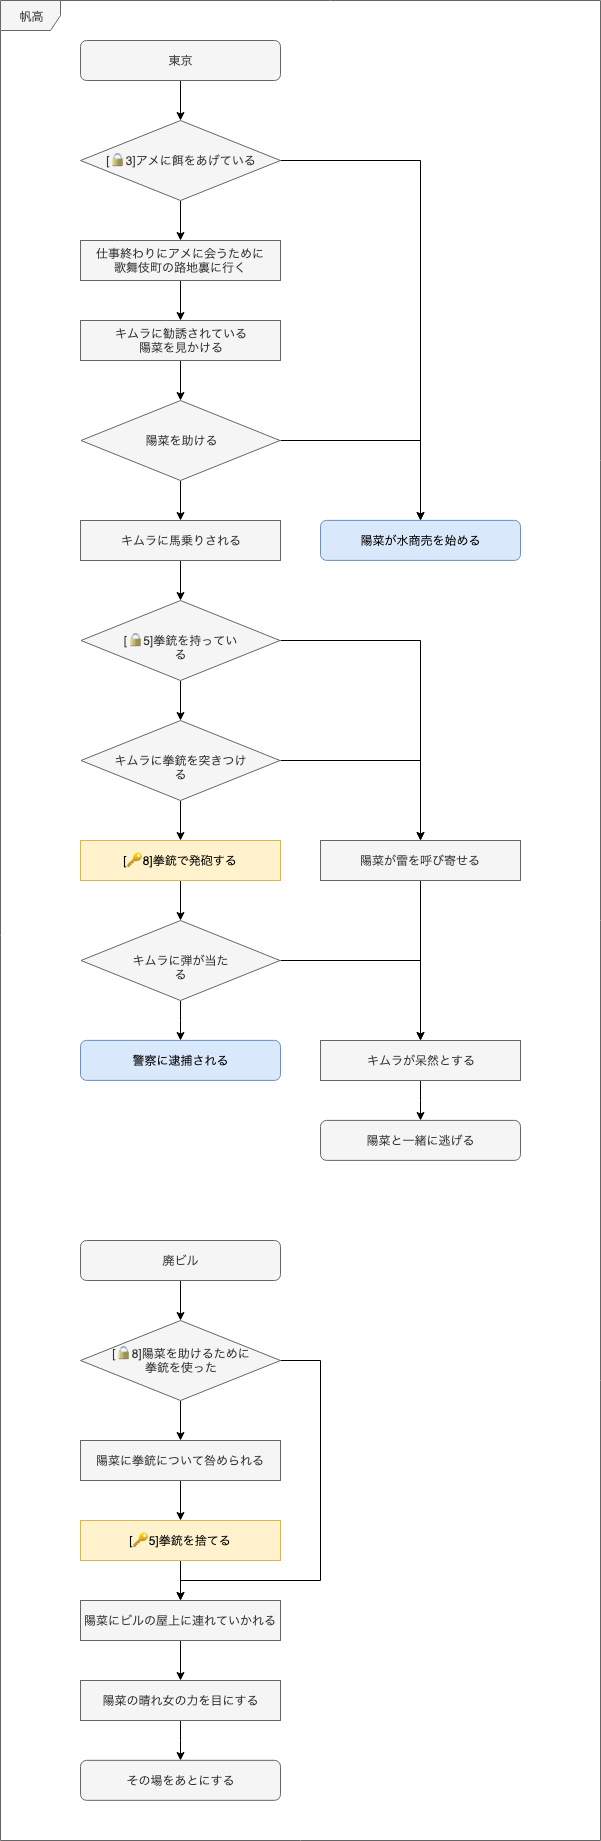 https://cdn-ak.f.st-hatena.com/images/fotolife/m/munieru_jp/20190913/20190913111725_original.png